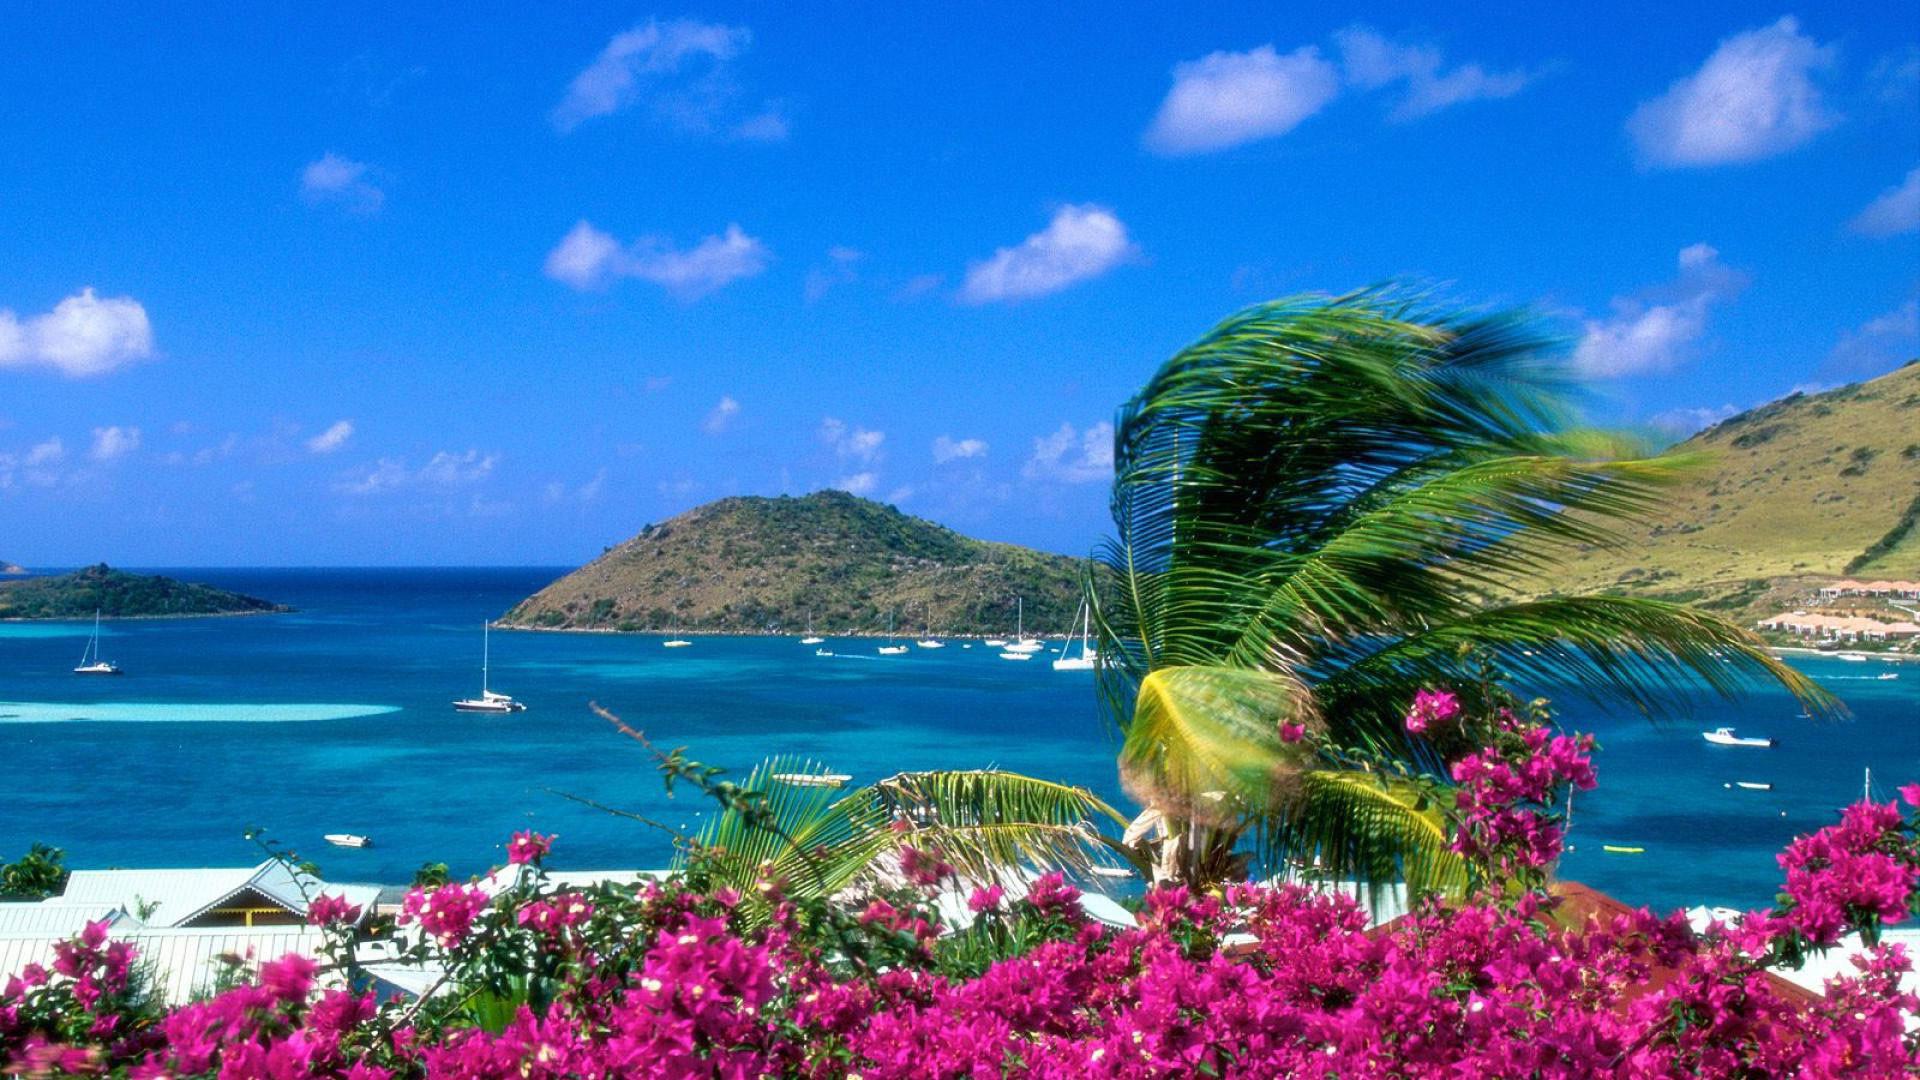 hd pics photos beautiful beach attractive hd quality desktop background  wallpaper